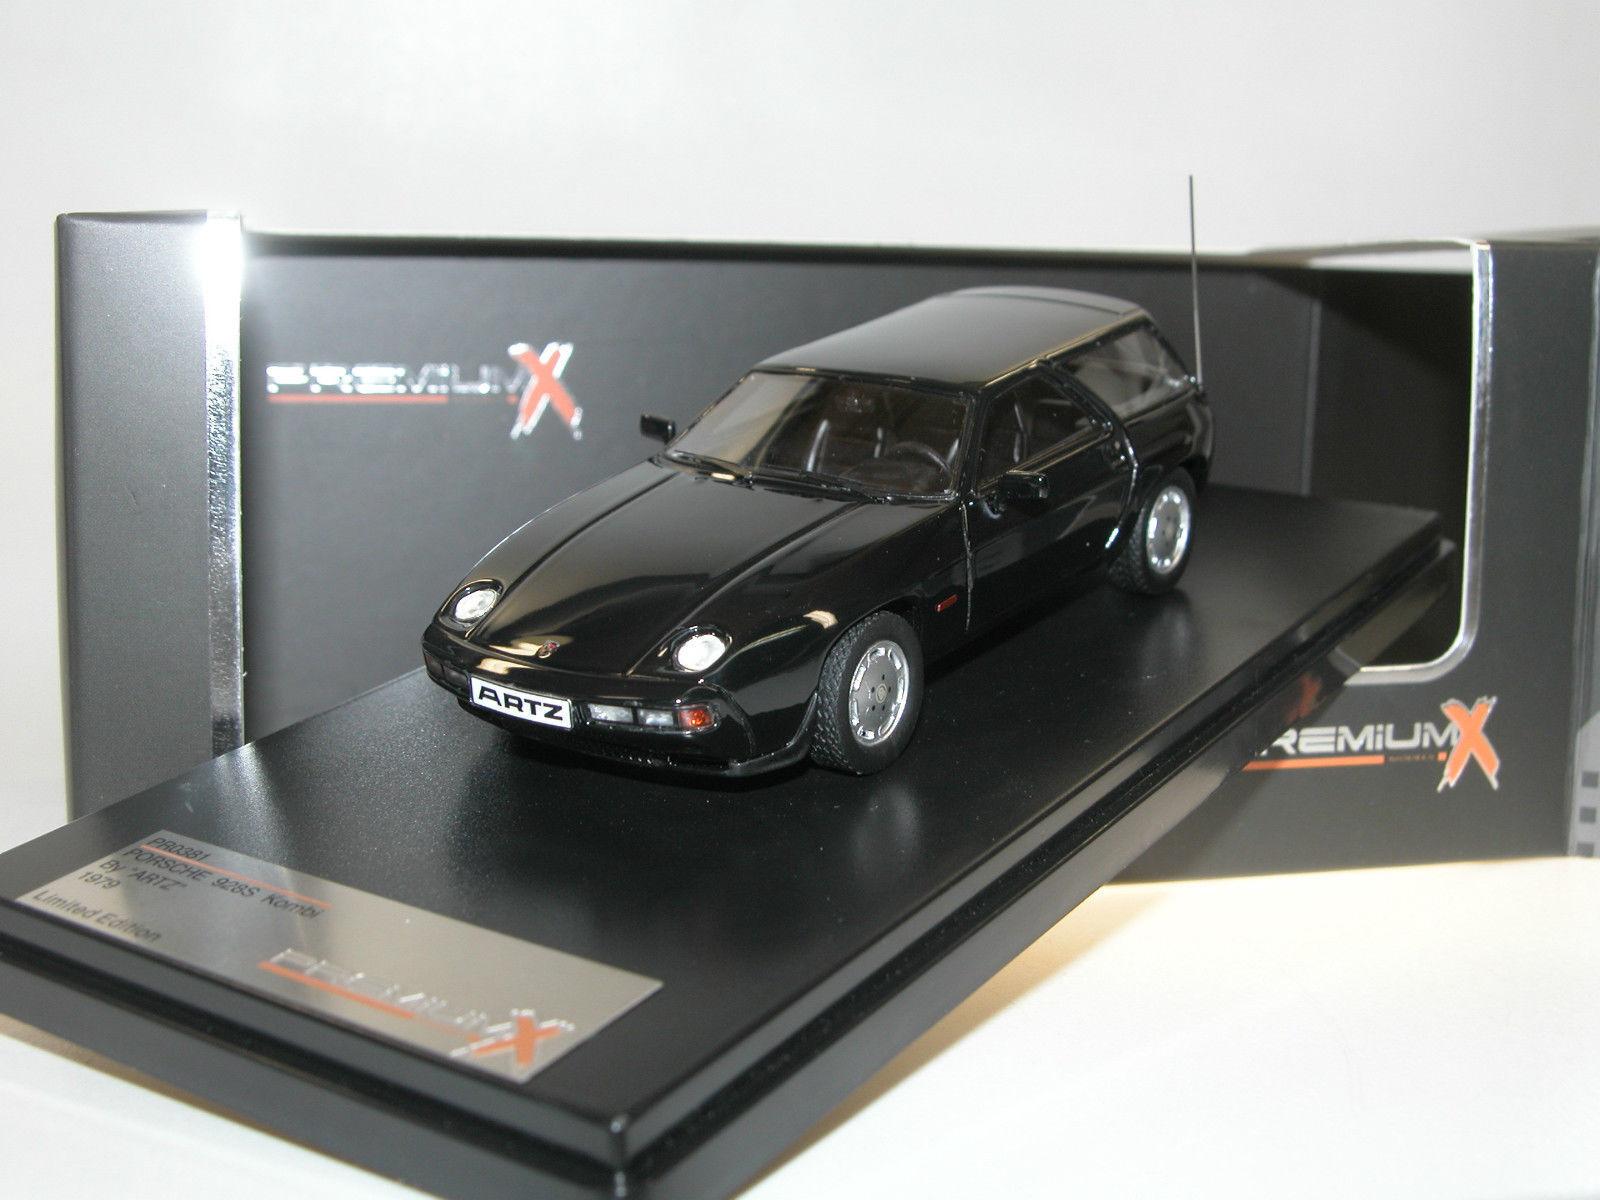 gran descuento Porsche Porsche Porsche 928 S KOMBI 1979 By Artz Negro Premium X PR0381 1 43 Resina Negro Negro  tienda de descuento